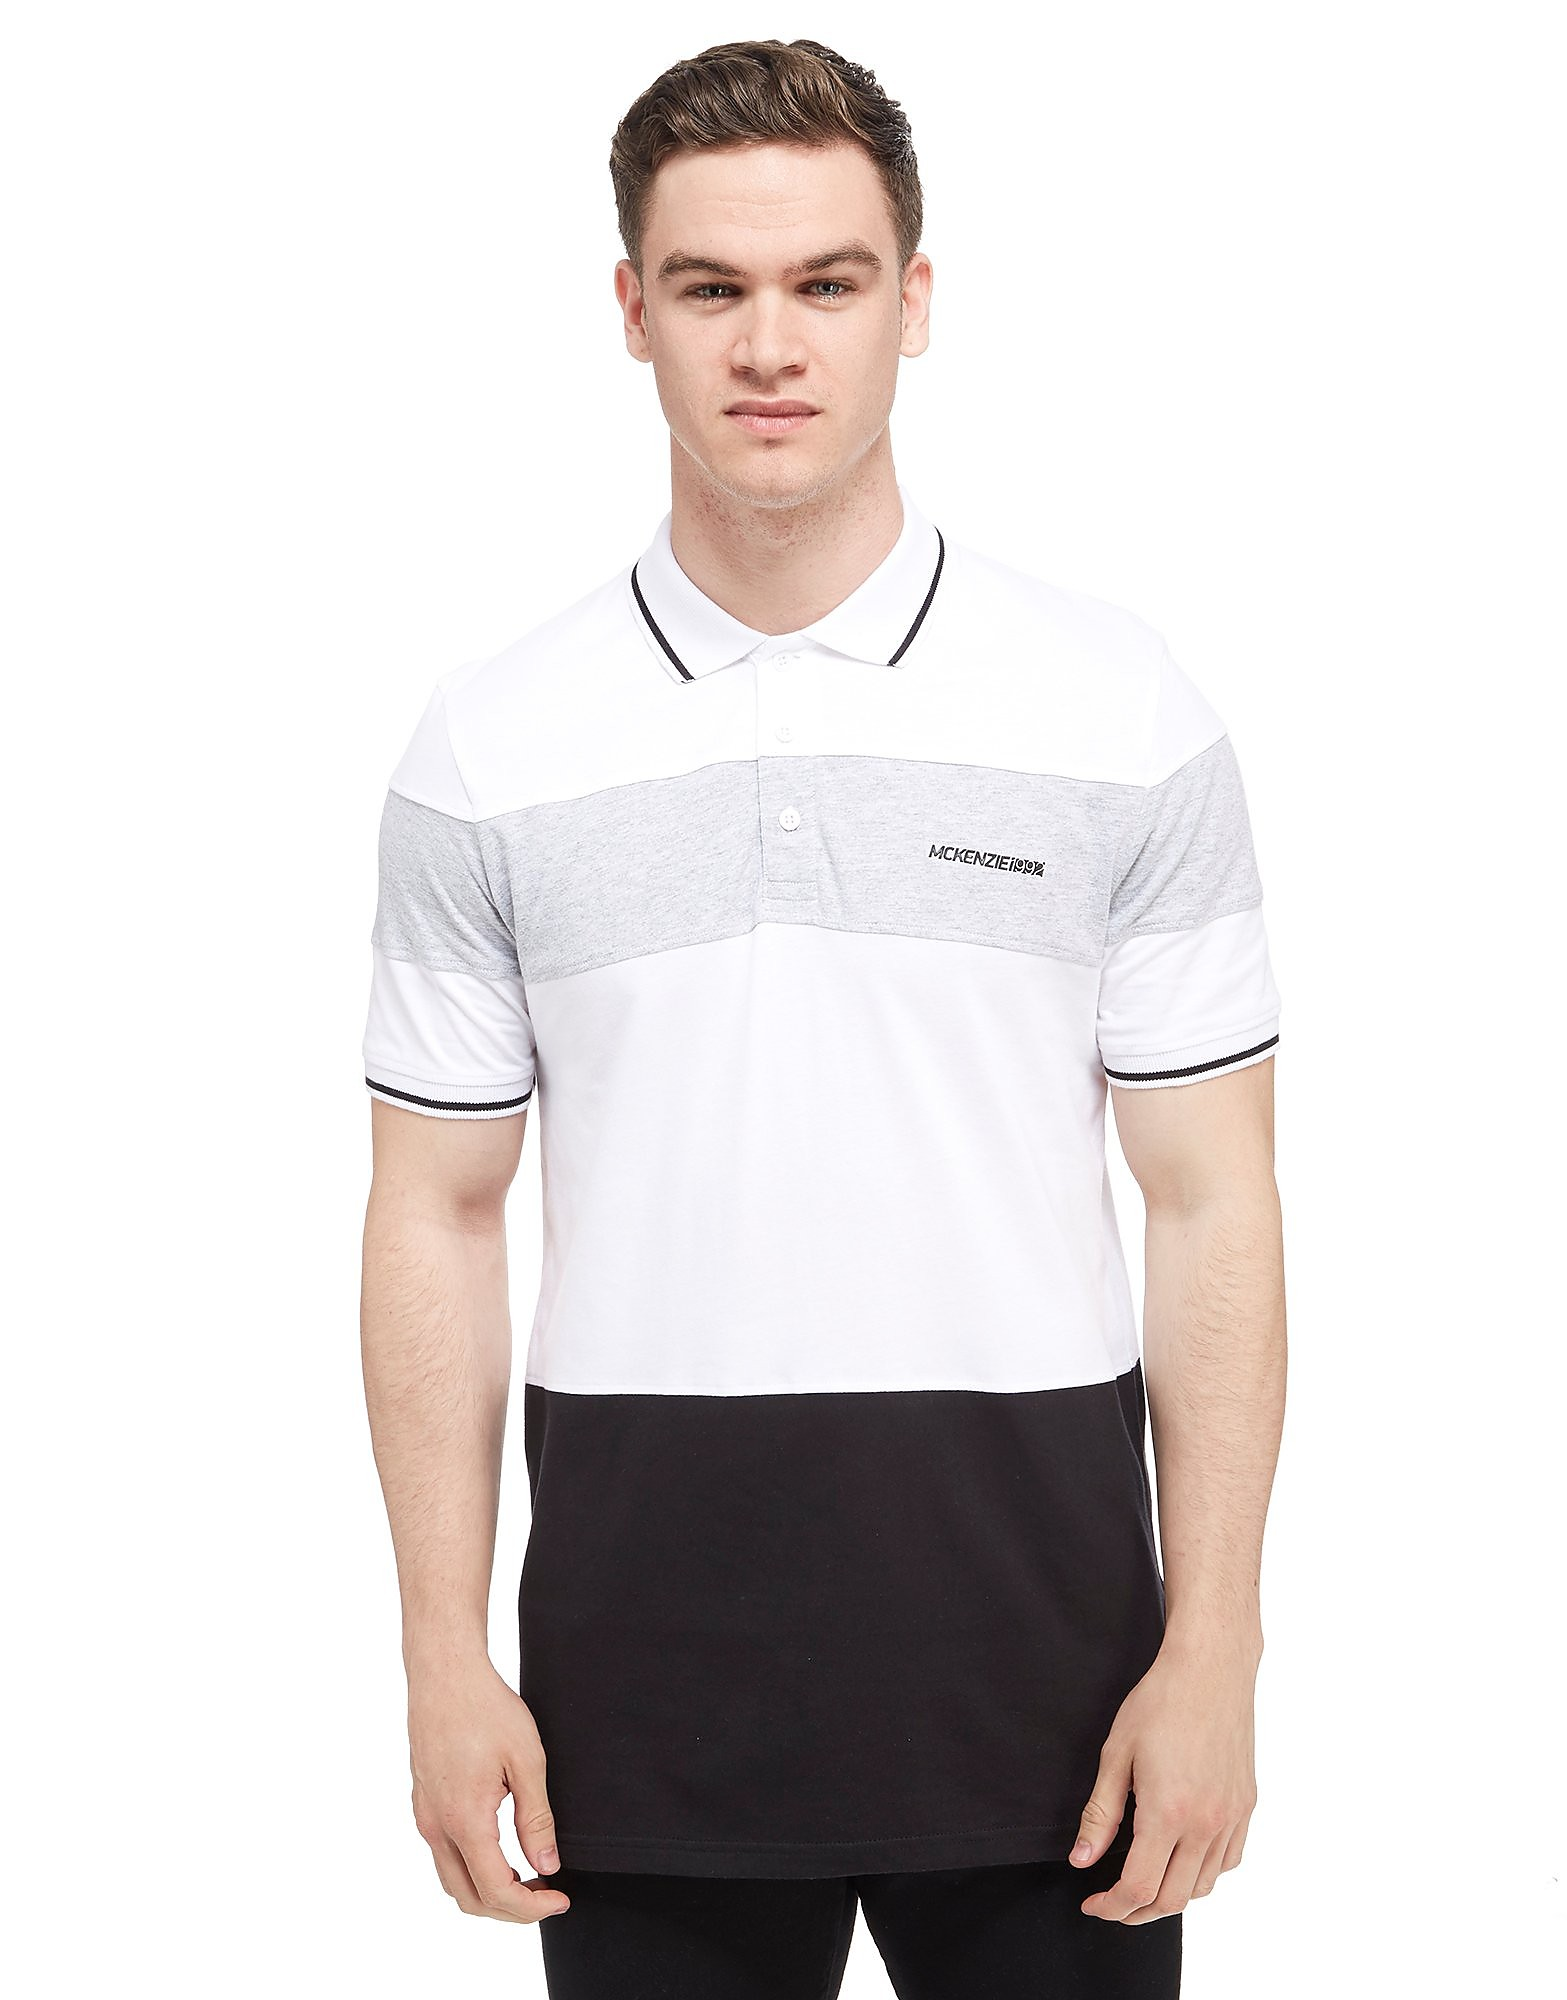 McKenzie Sphinx Polo T-shirt